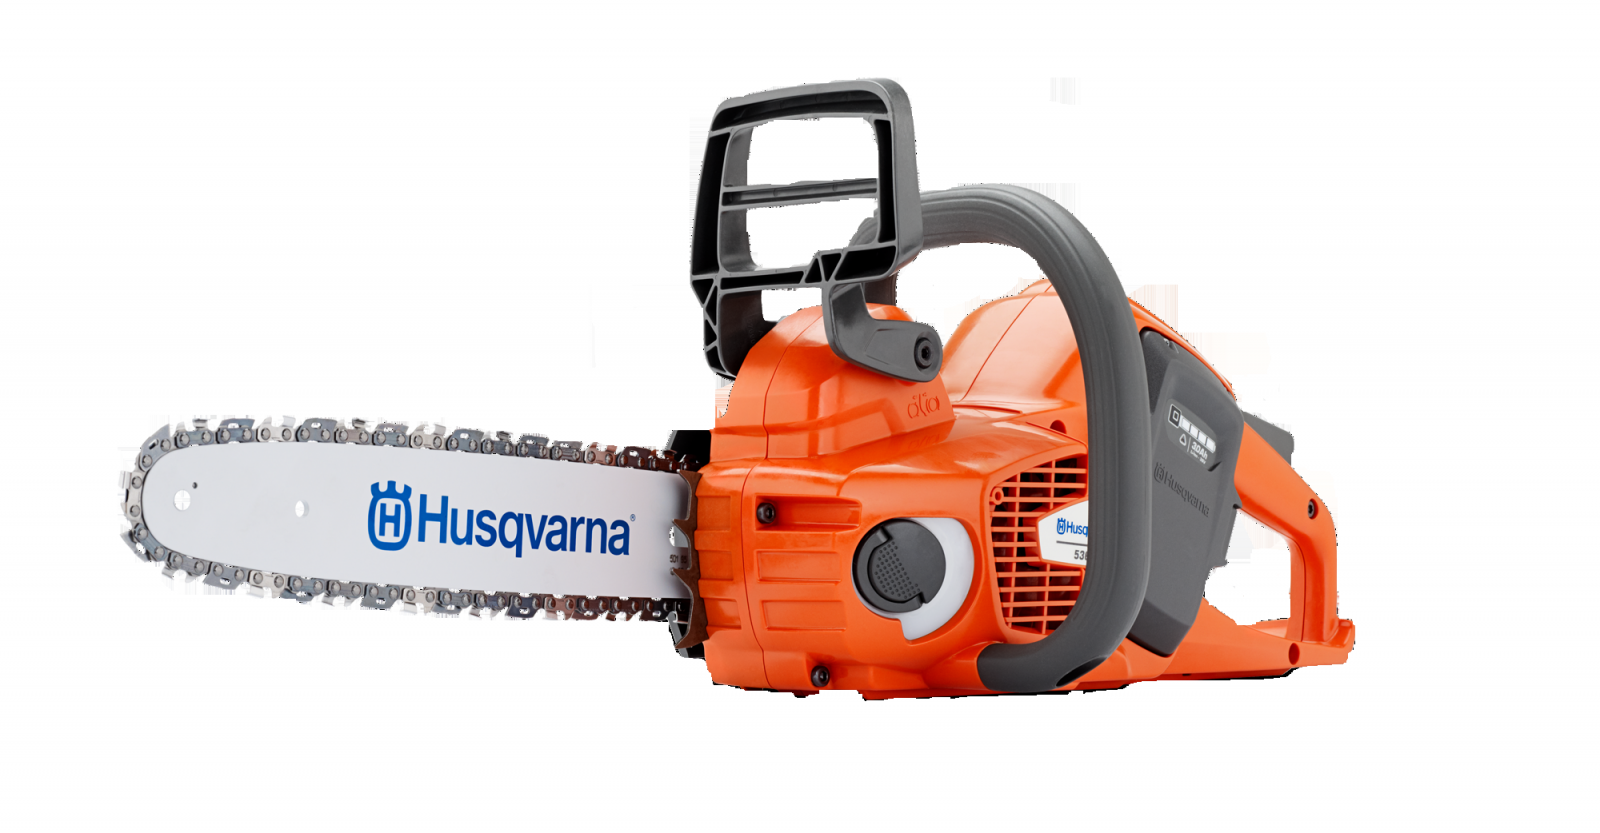 Motosserra Husqvarna 536Li XP a bateria 36 volts - Hs Floresta e Jardim